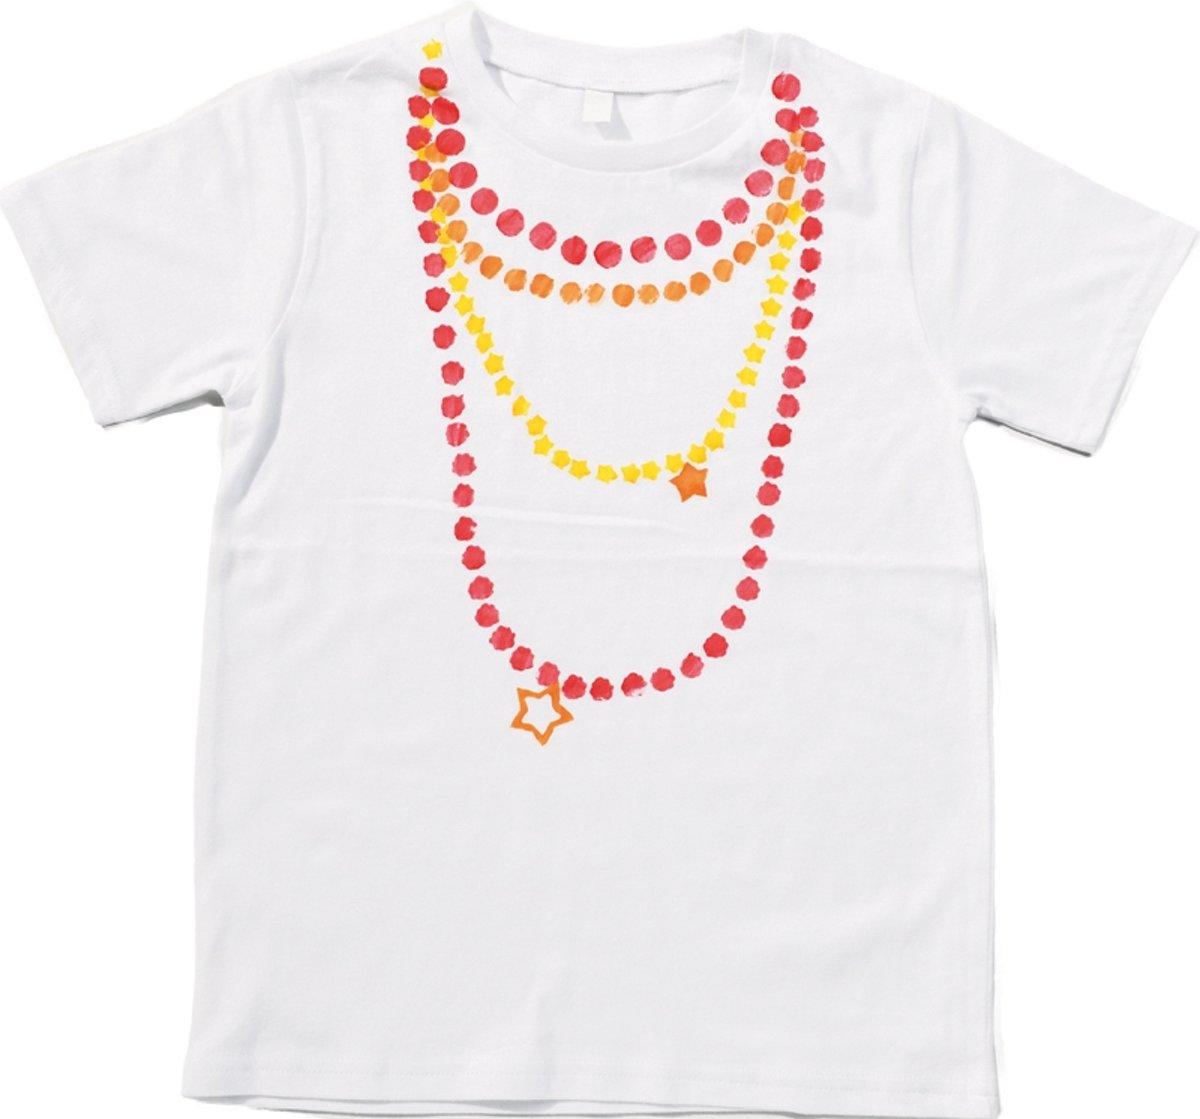 New bol.com   SES Textielverf met t-shirt, SES   Speelgoed #NR64